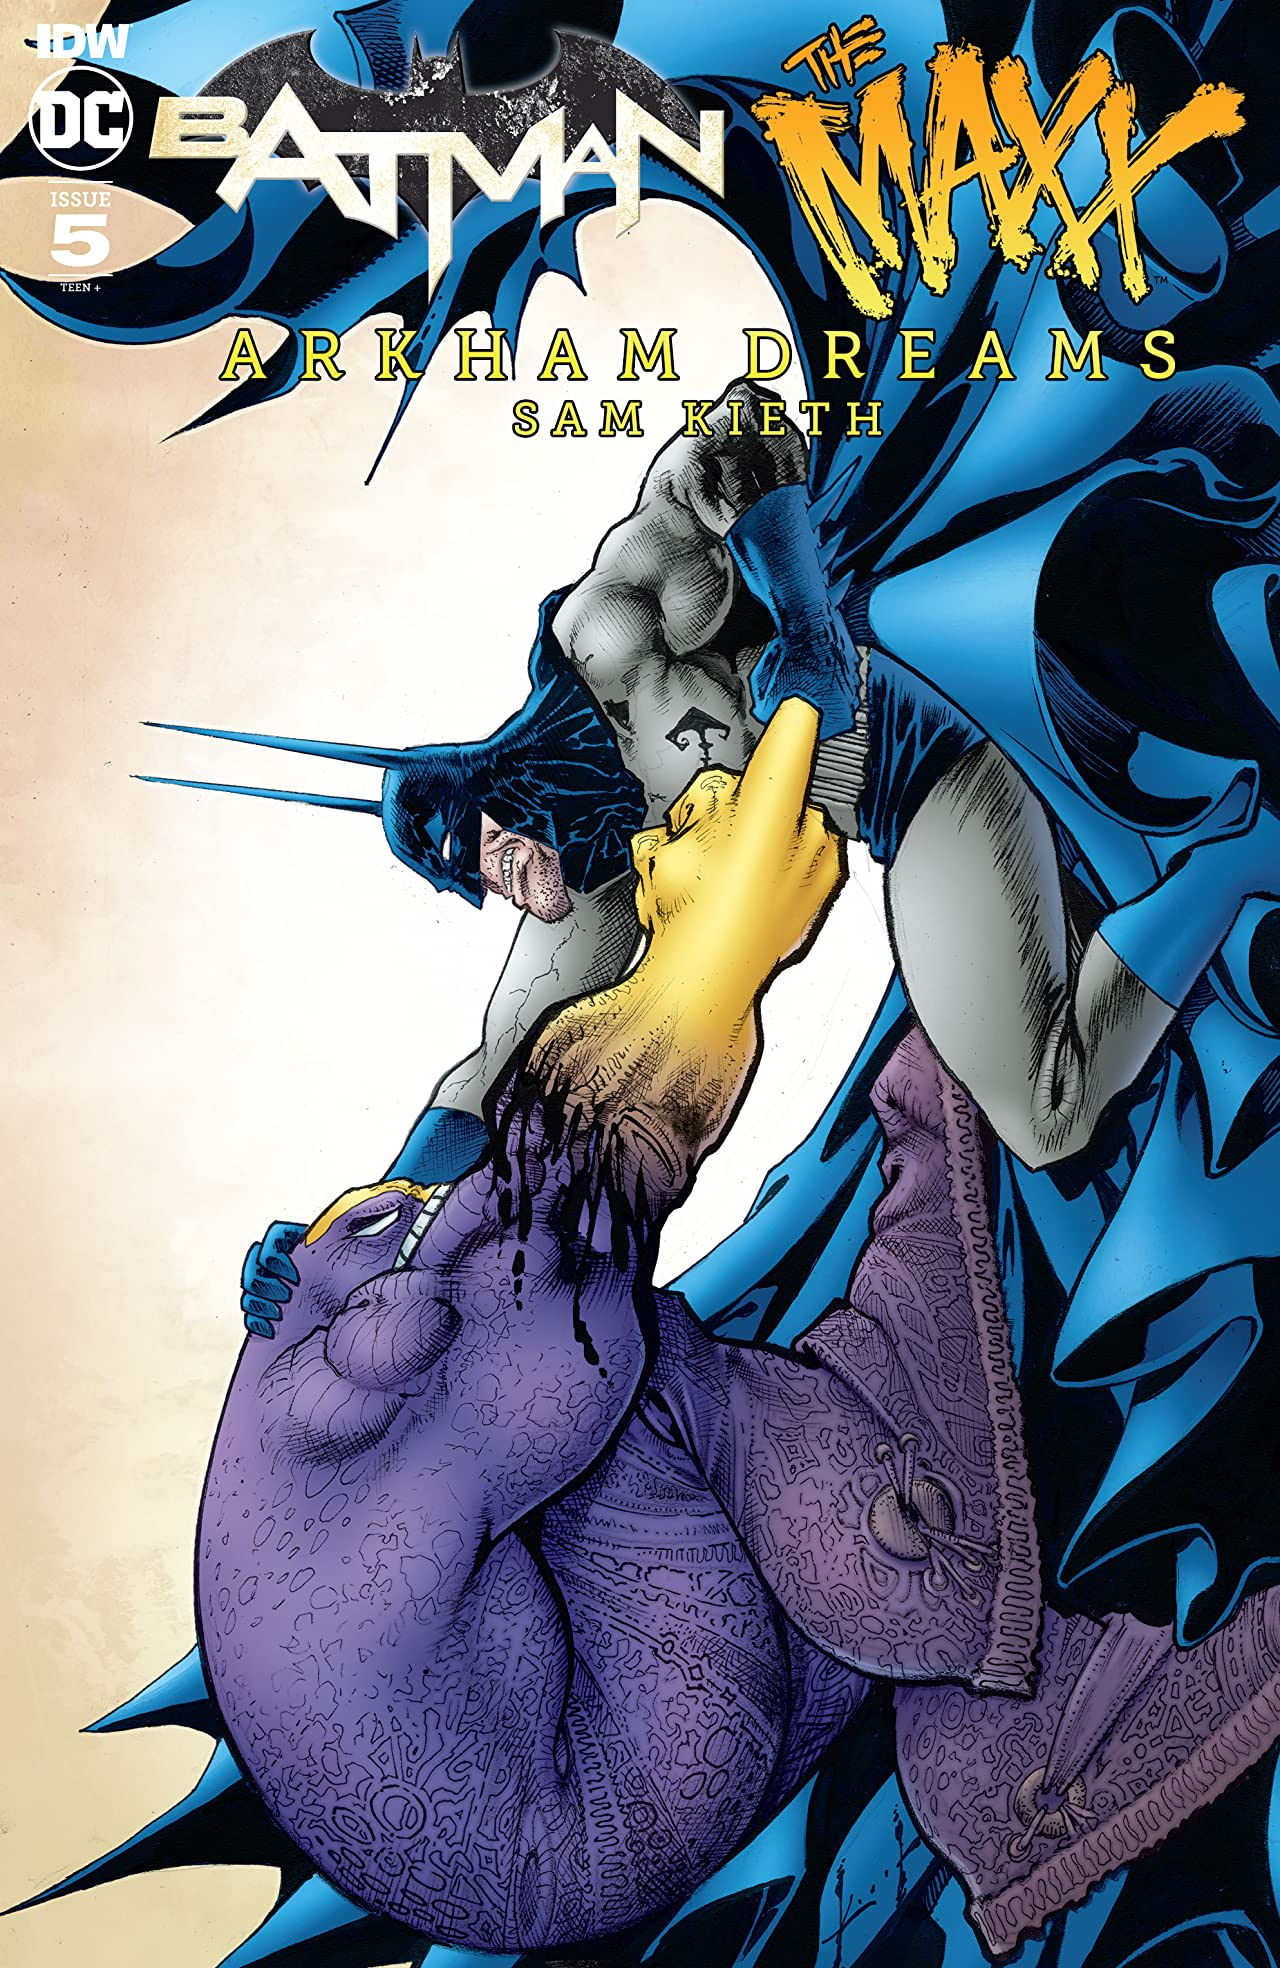 Batman/The Maxx #5 (of 5)